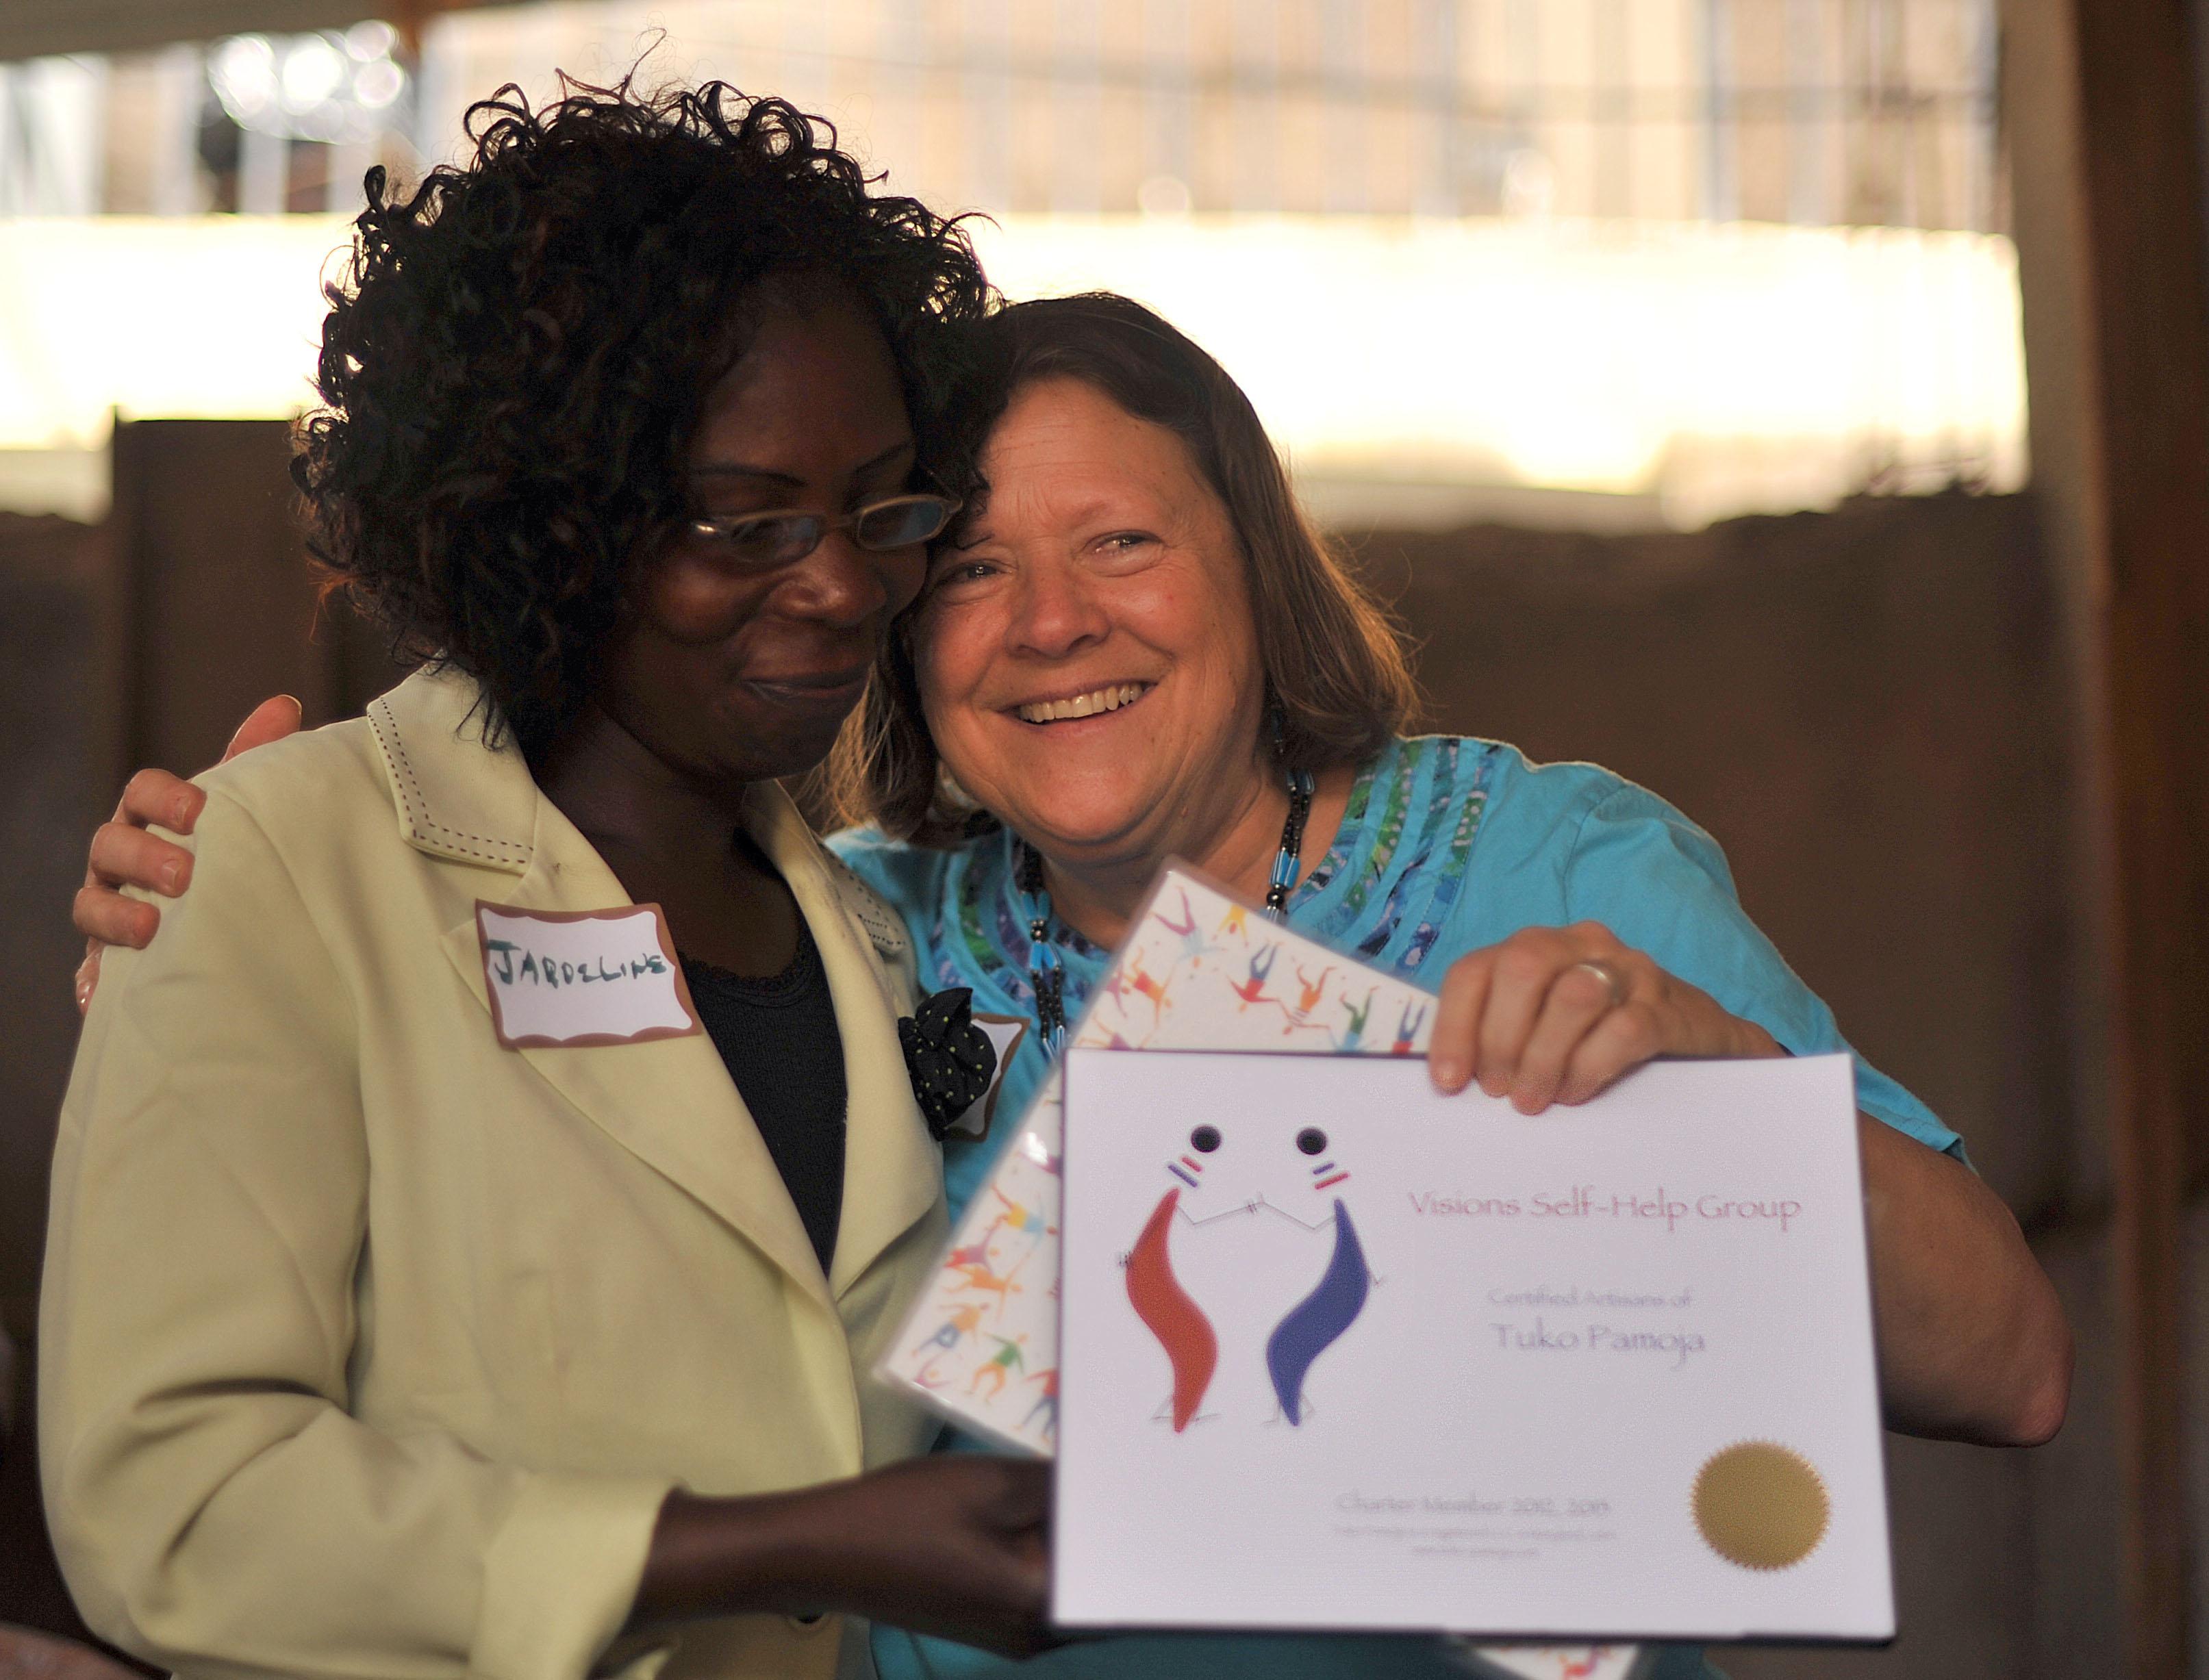 Tuko Pamoja certificate for the Vision Self help group